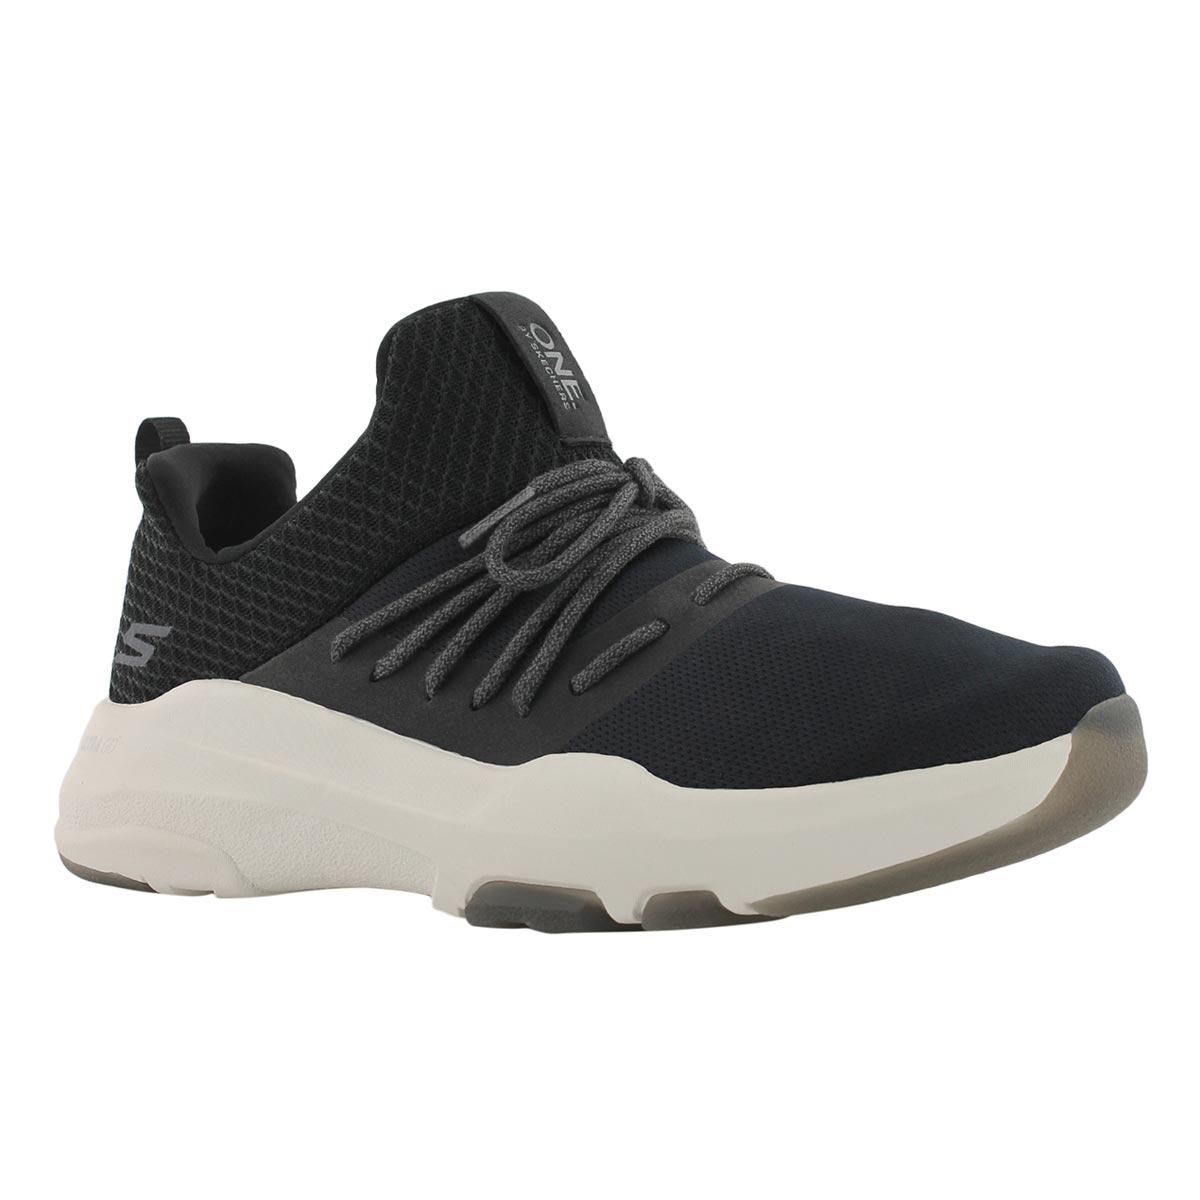 Women's ELEMENT ULTRA  black/white sneakers